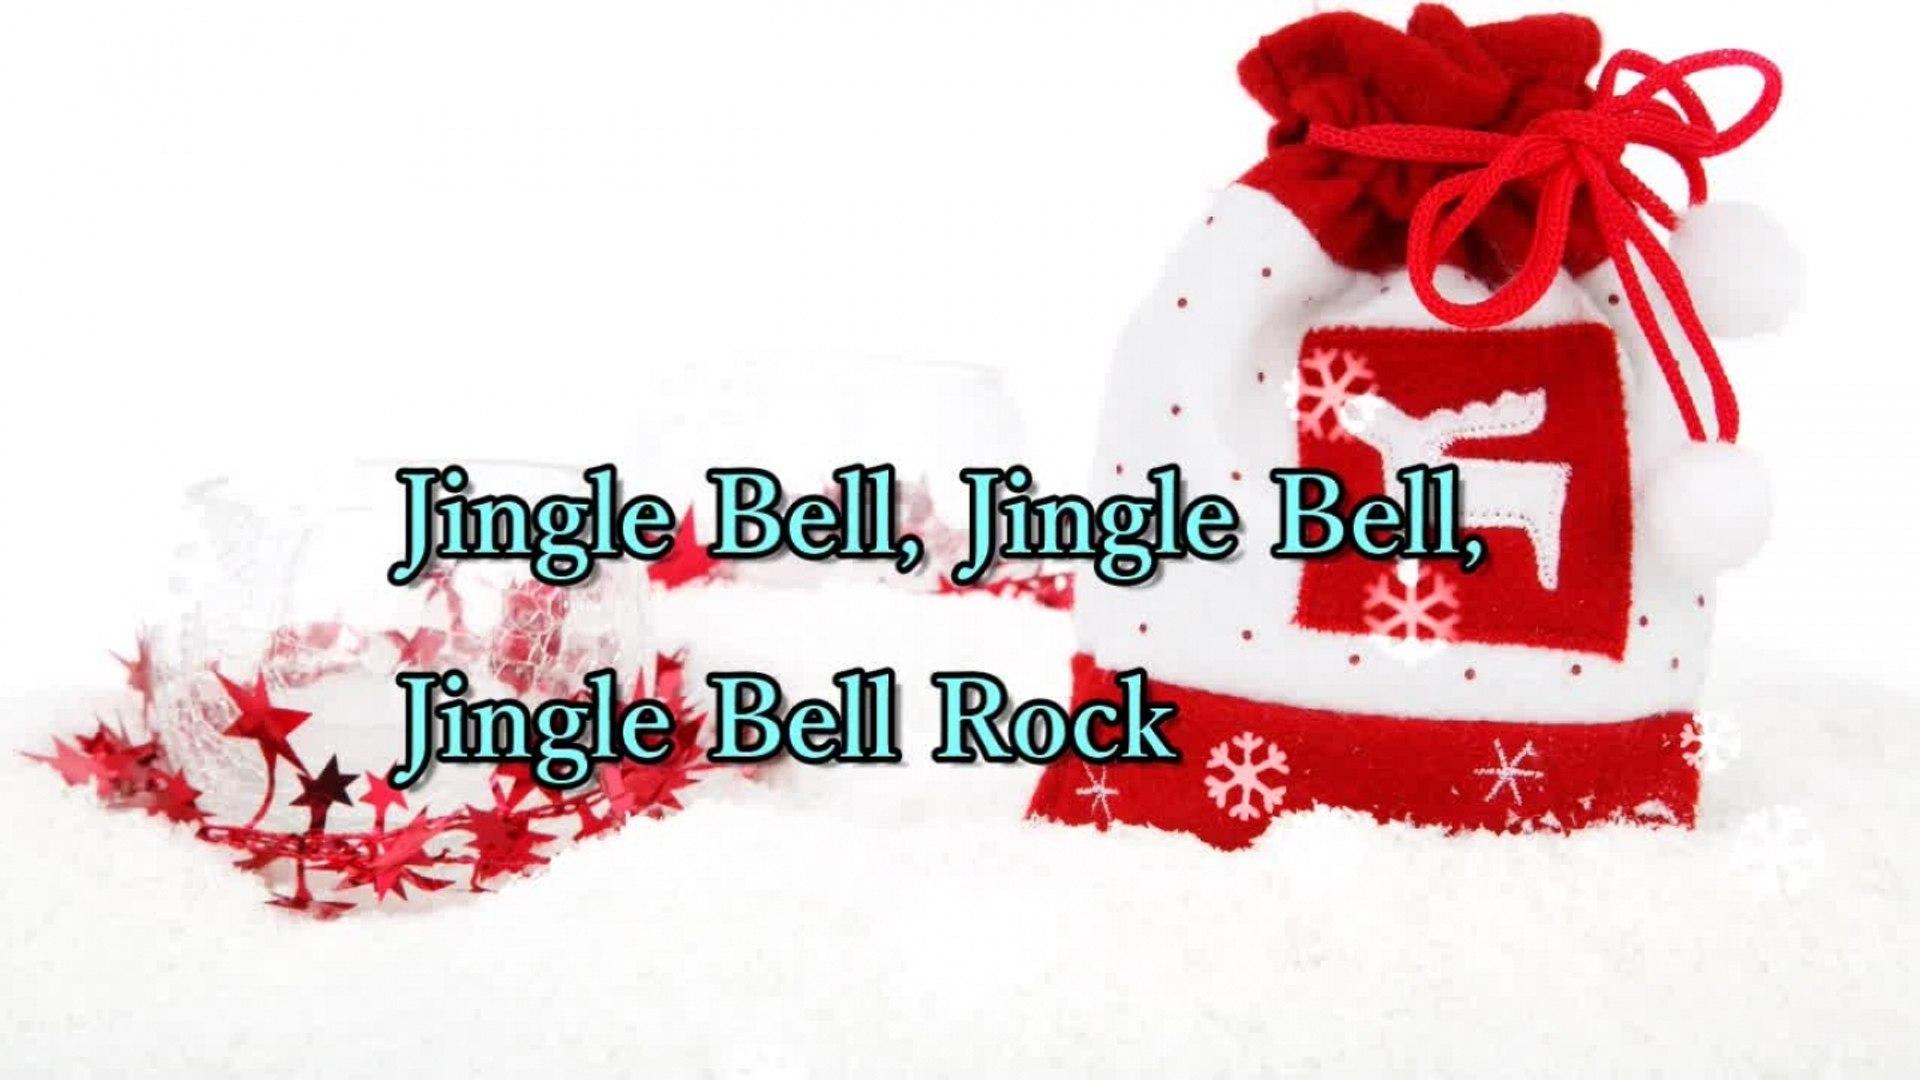 Christmas Songs - Jingle Bell Rock - Lyrics Video